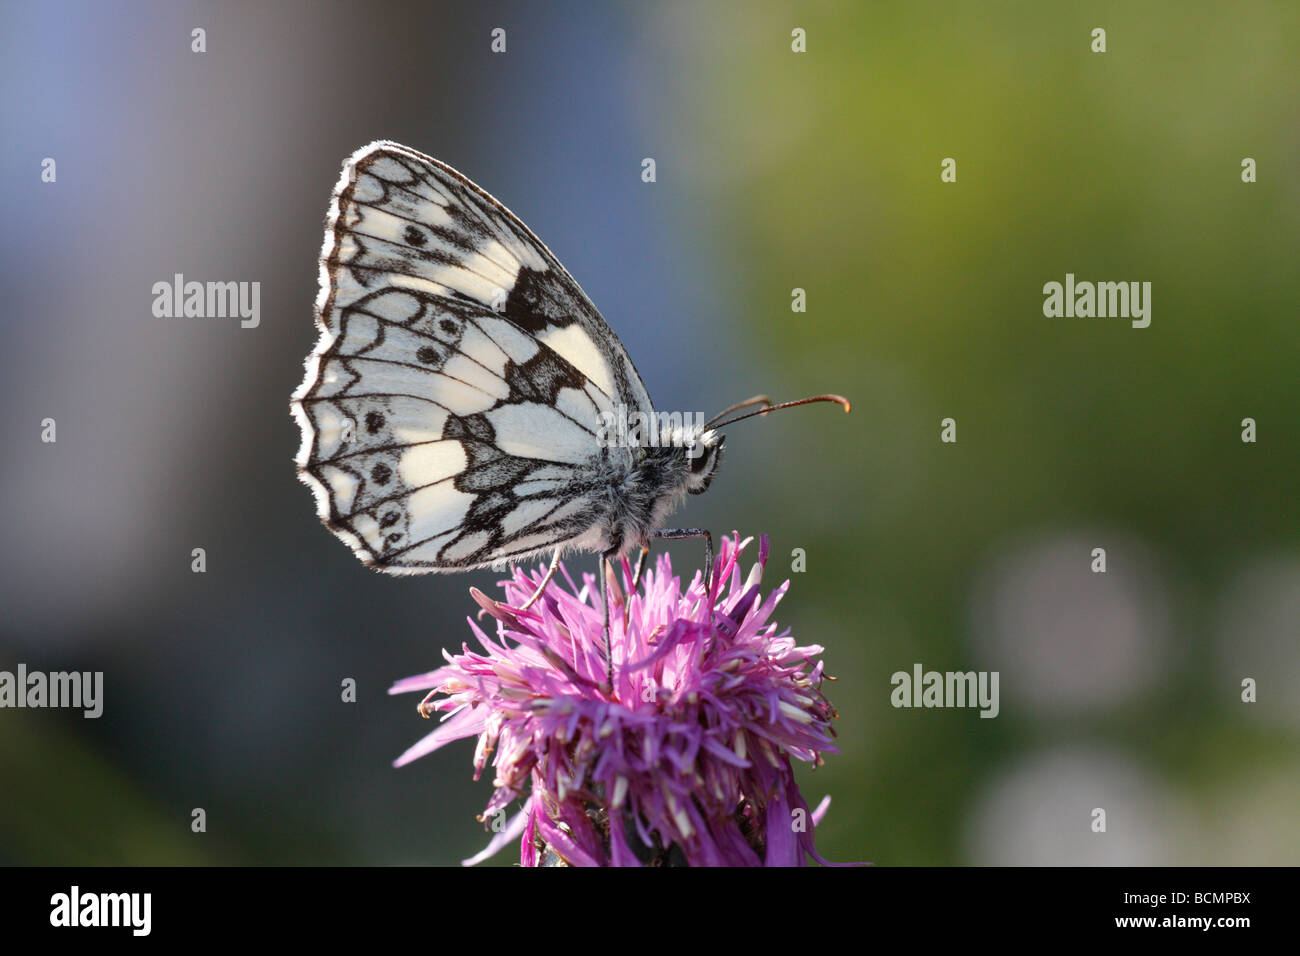 Marbled White Butterfly, Melanargia galathea - Stock Image